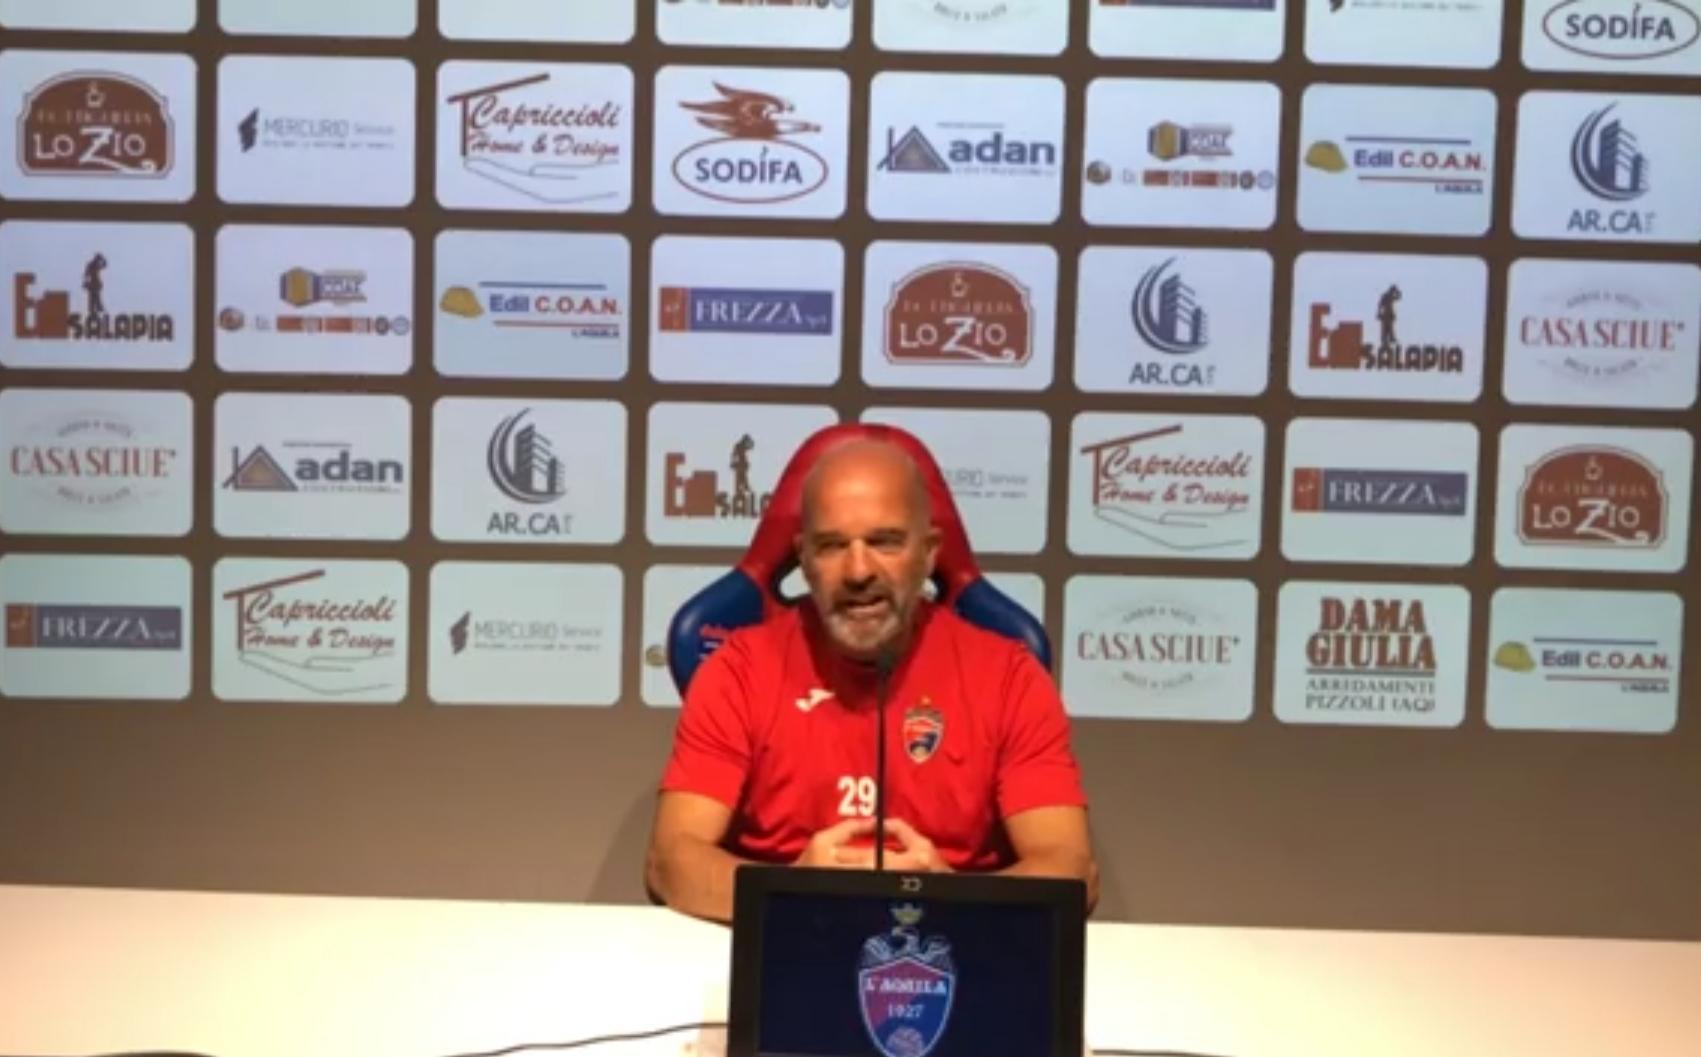 Giampaolo-federico2021.jpg